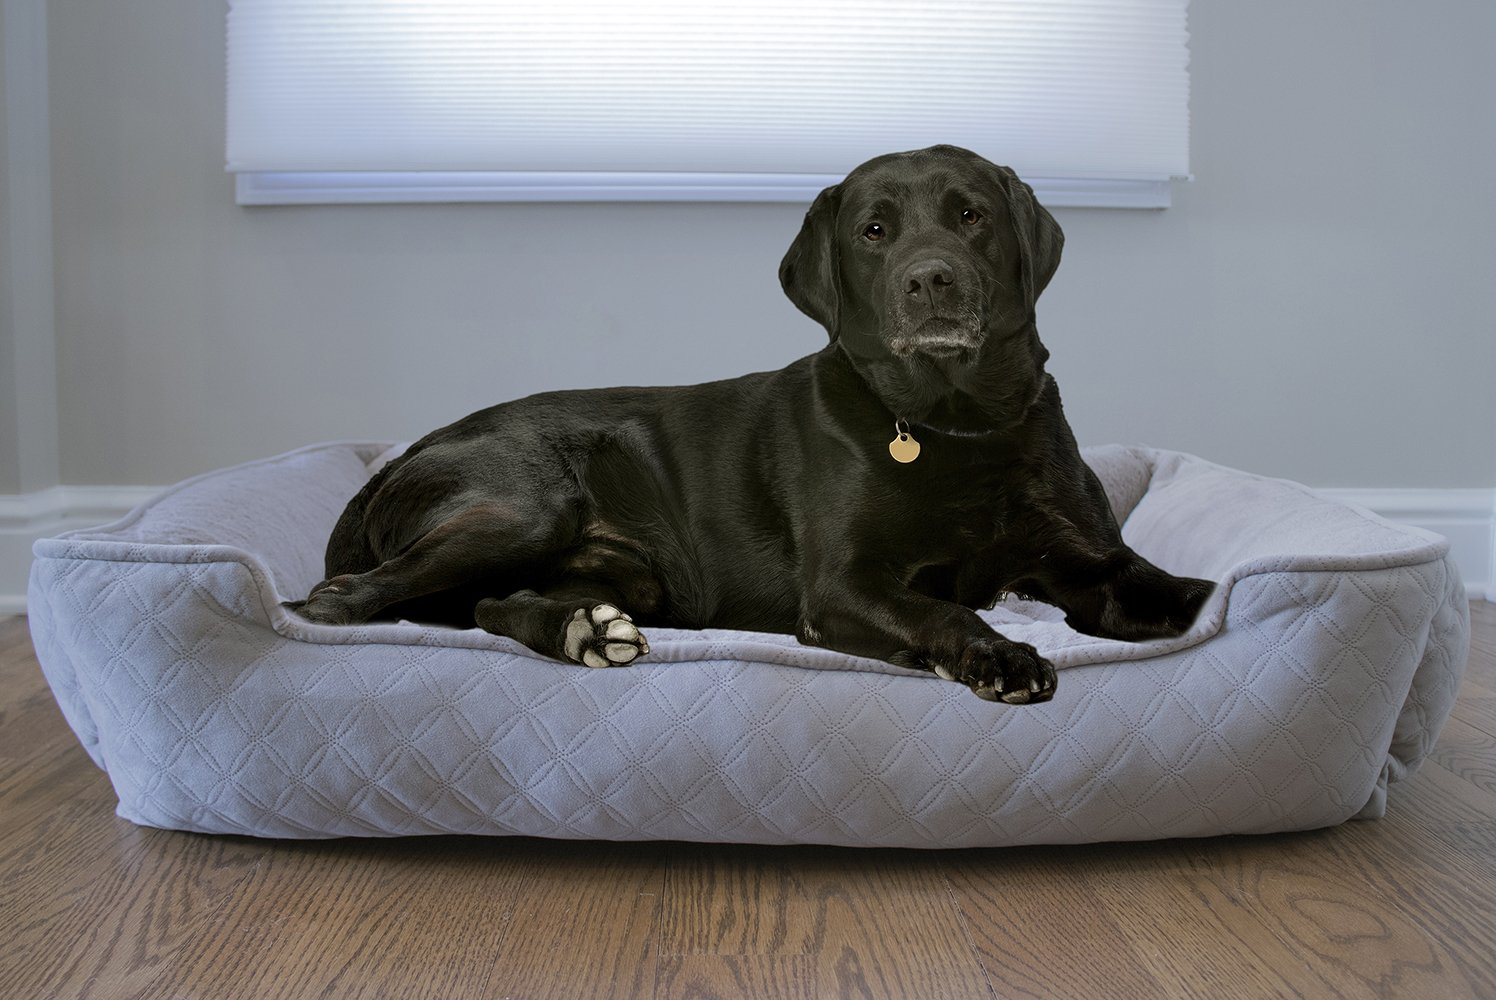 Arlee 59-01005CLS Cuddler Lounger and Cuddler Pet Bed, Large/X-Large, Cobblestone Taupe by Arlee